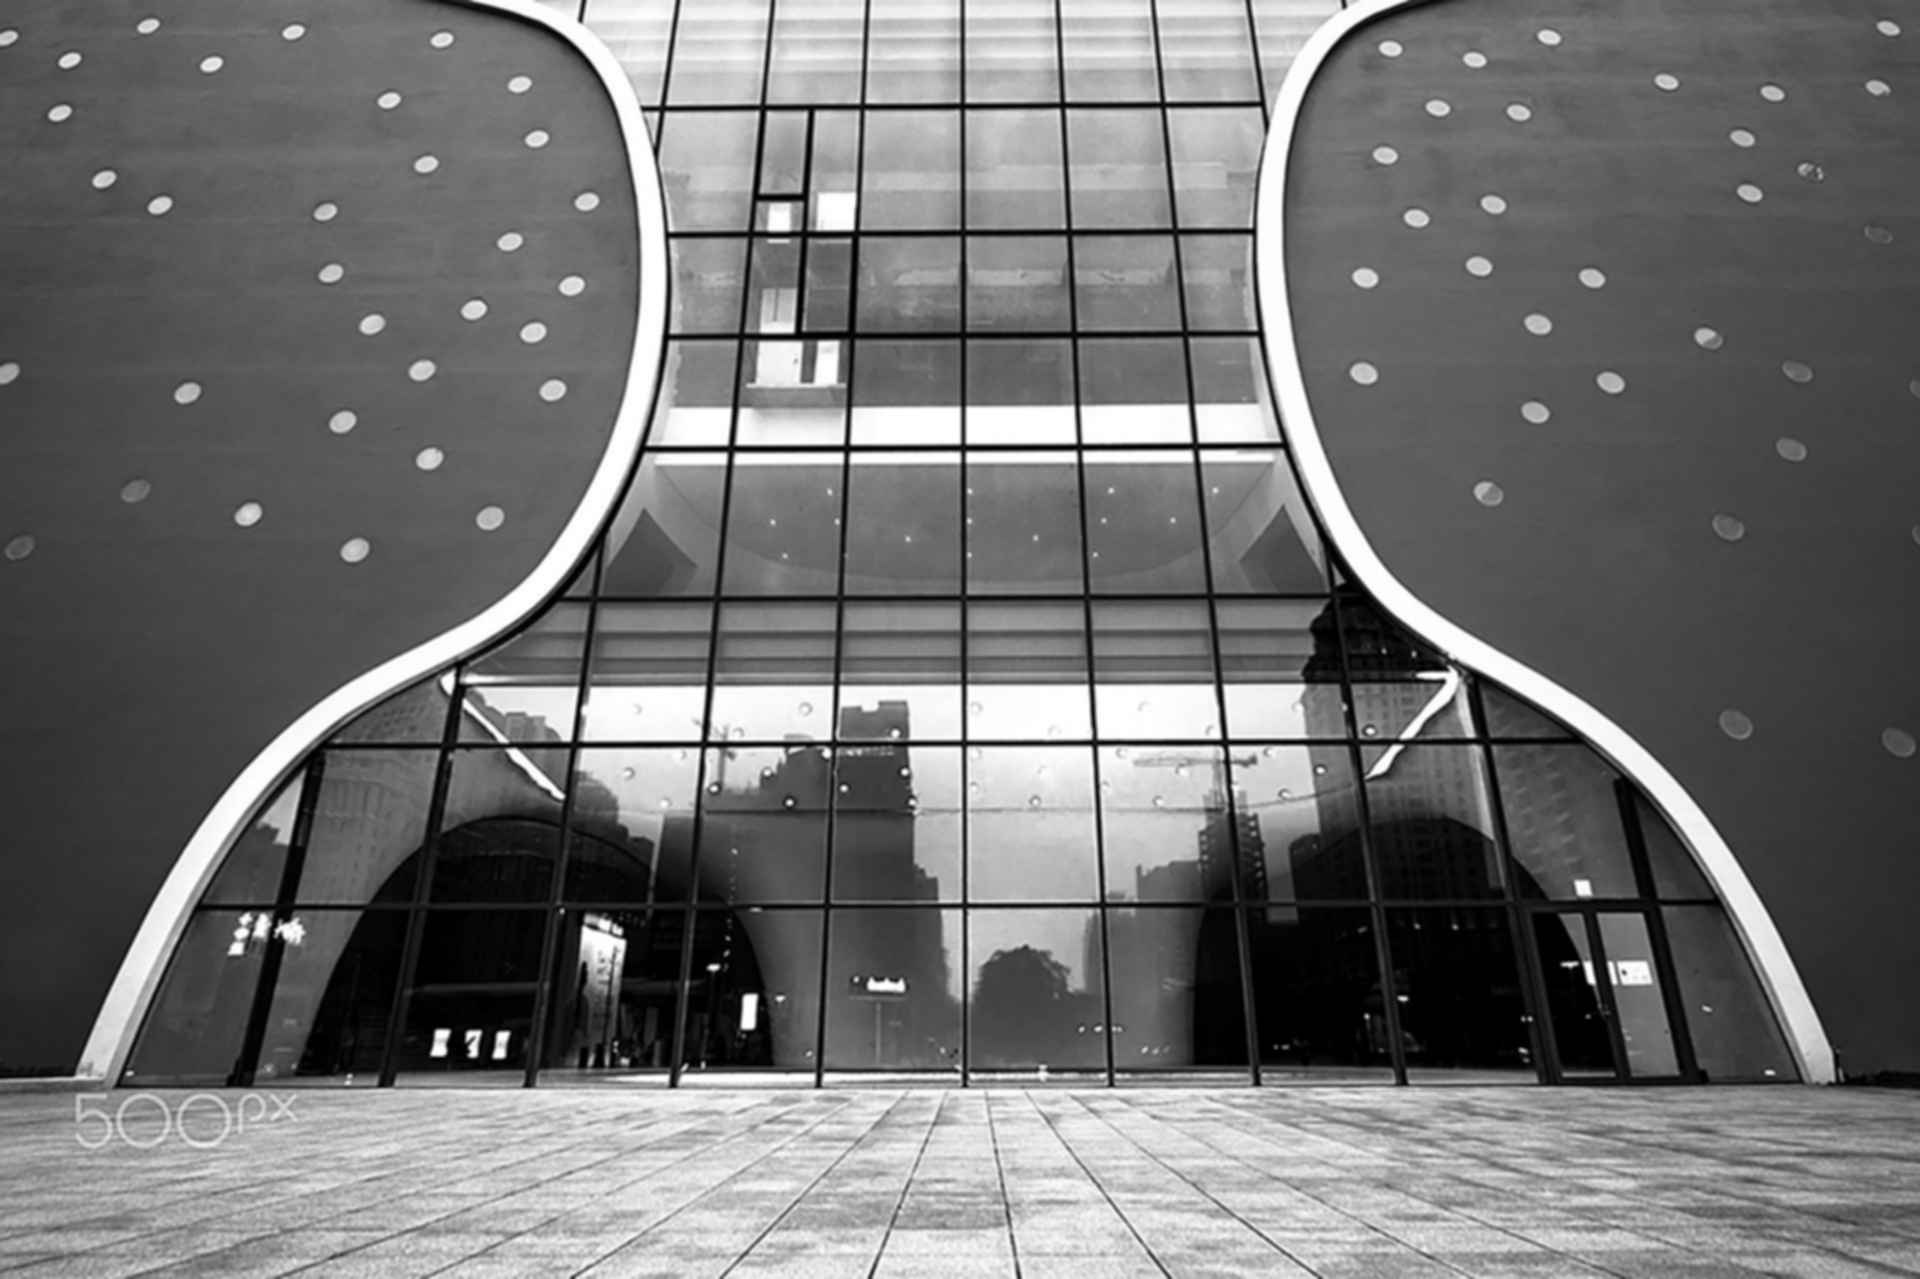 Taichung Metropolitan Opera House - Exterior